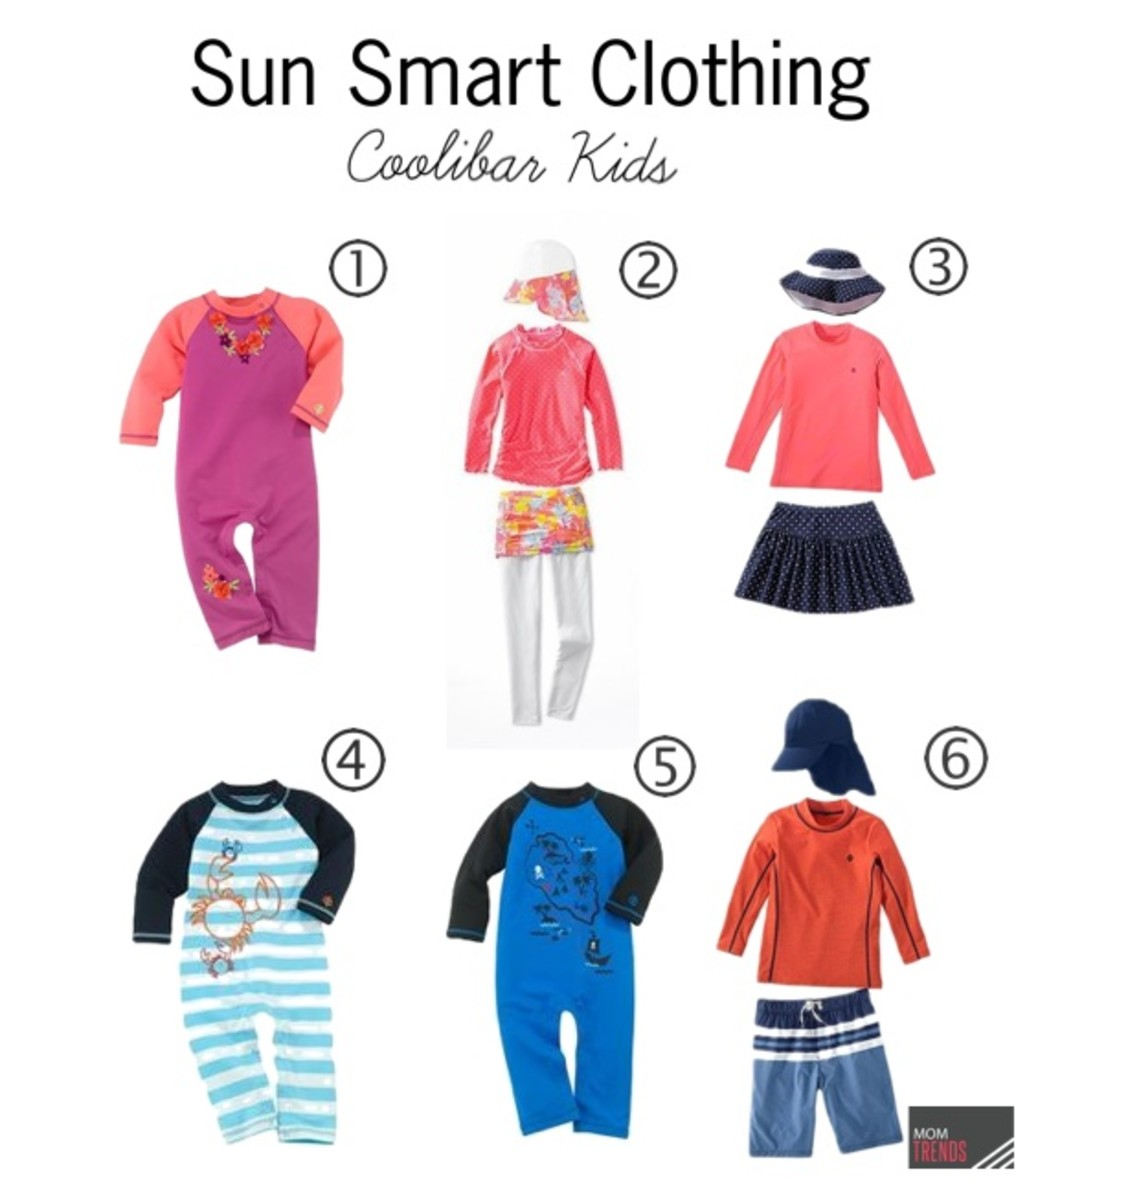 SPF swimwear for kids